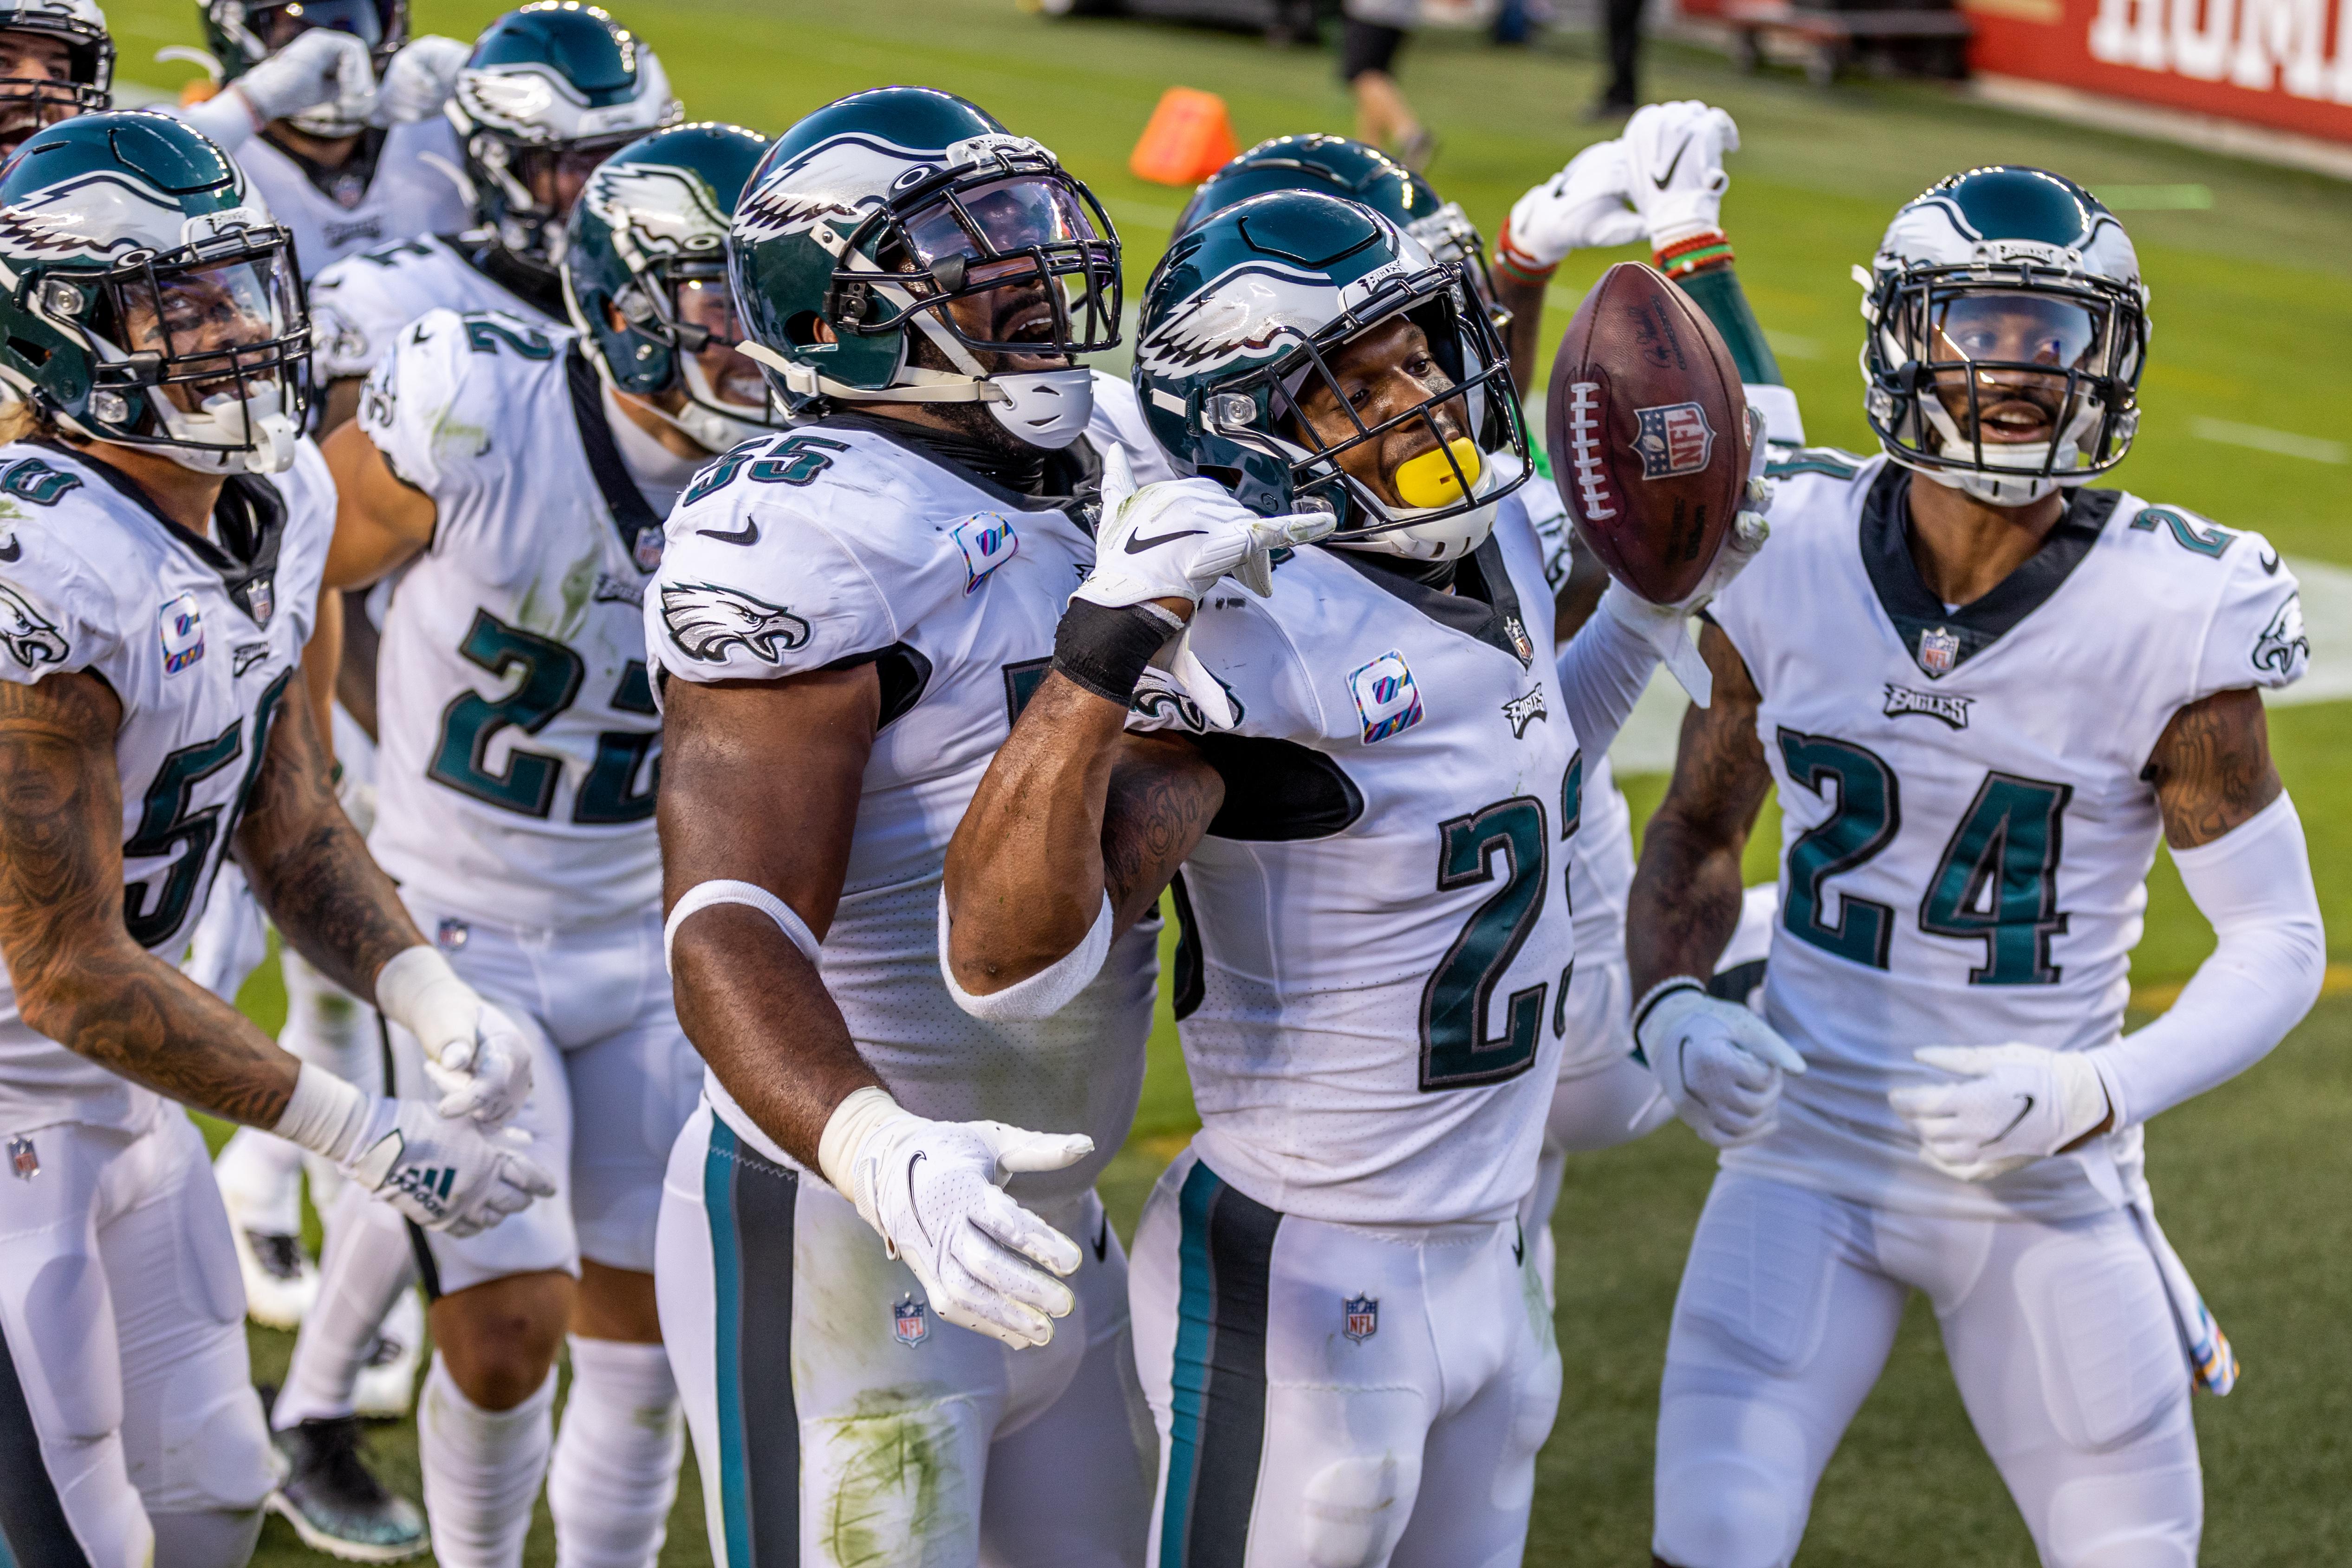 NFL: OCT 04 Eagles at 49ers